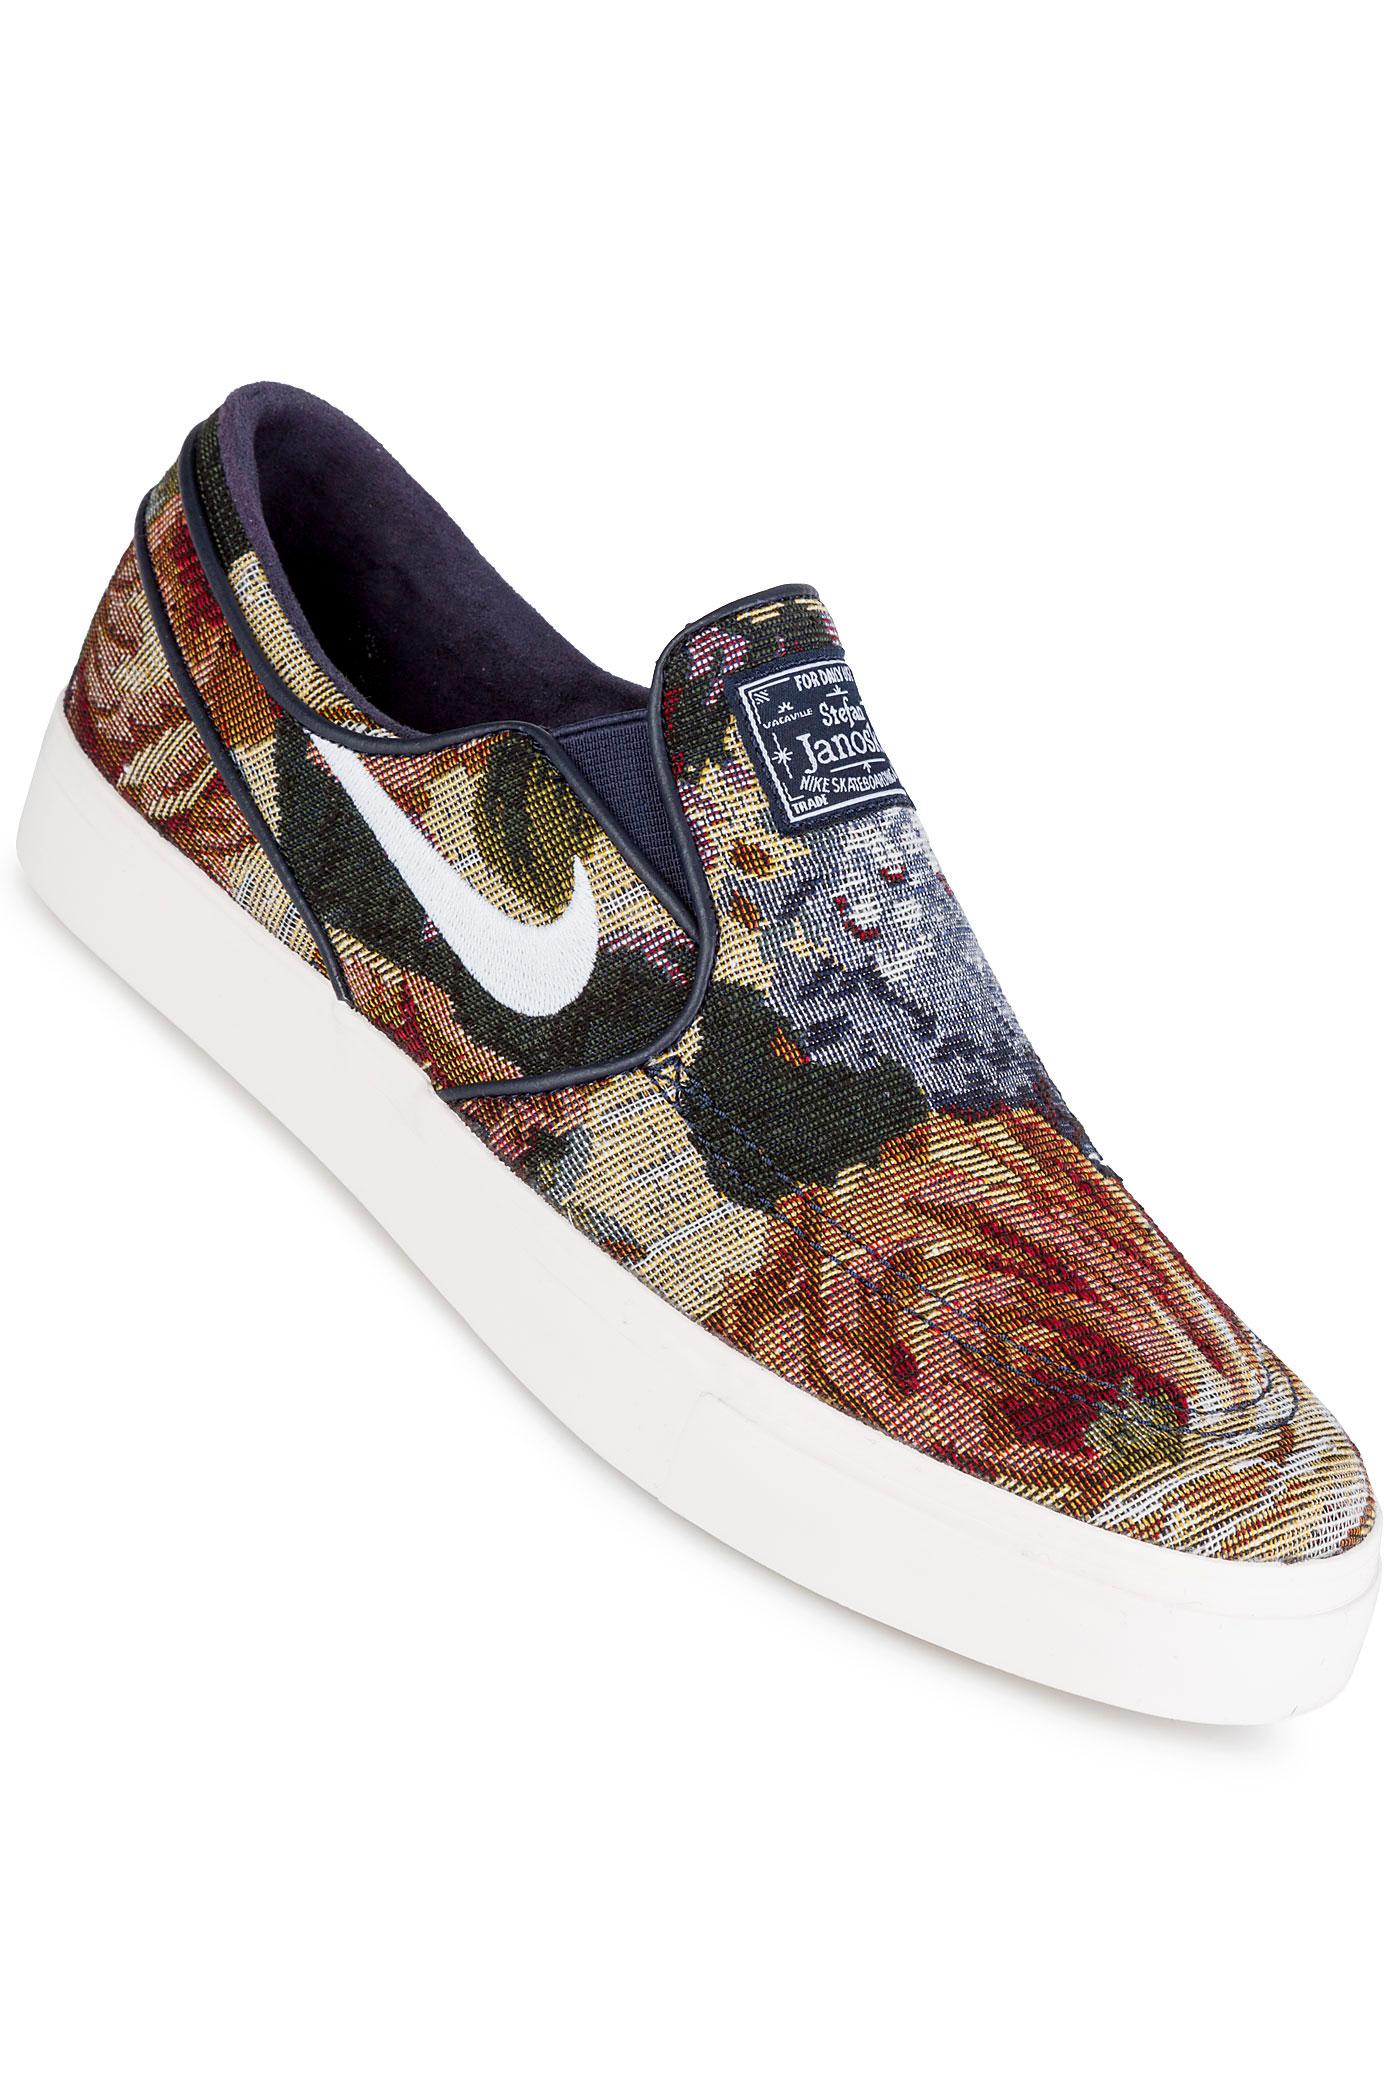 nike sb stefan janoski slip canvas premium shoes tapestry